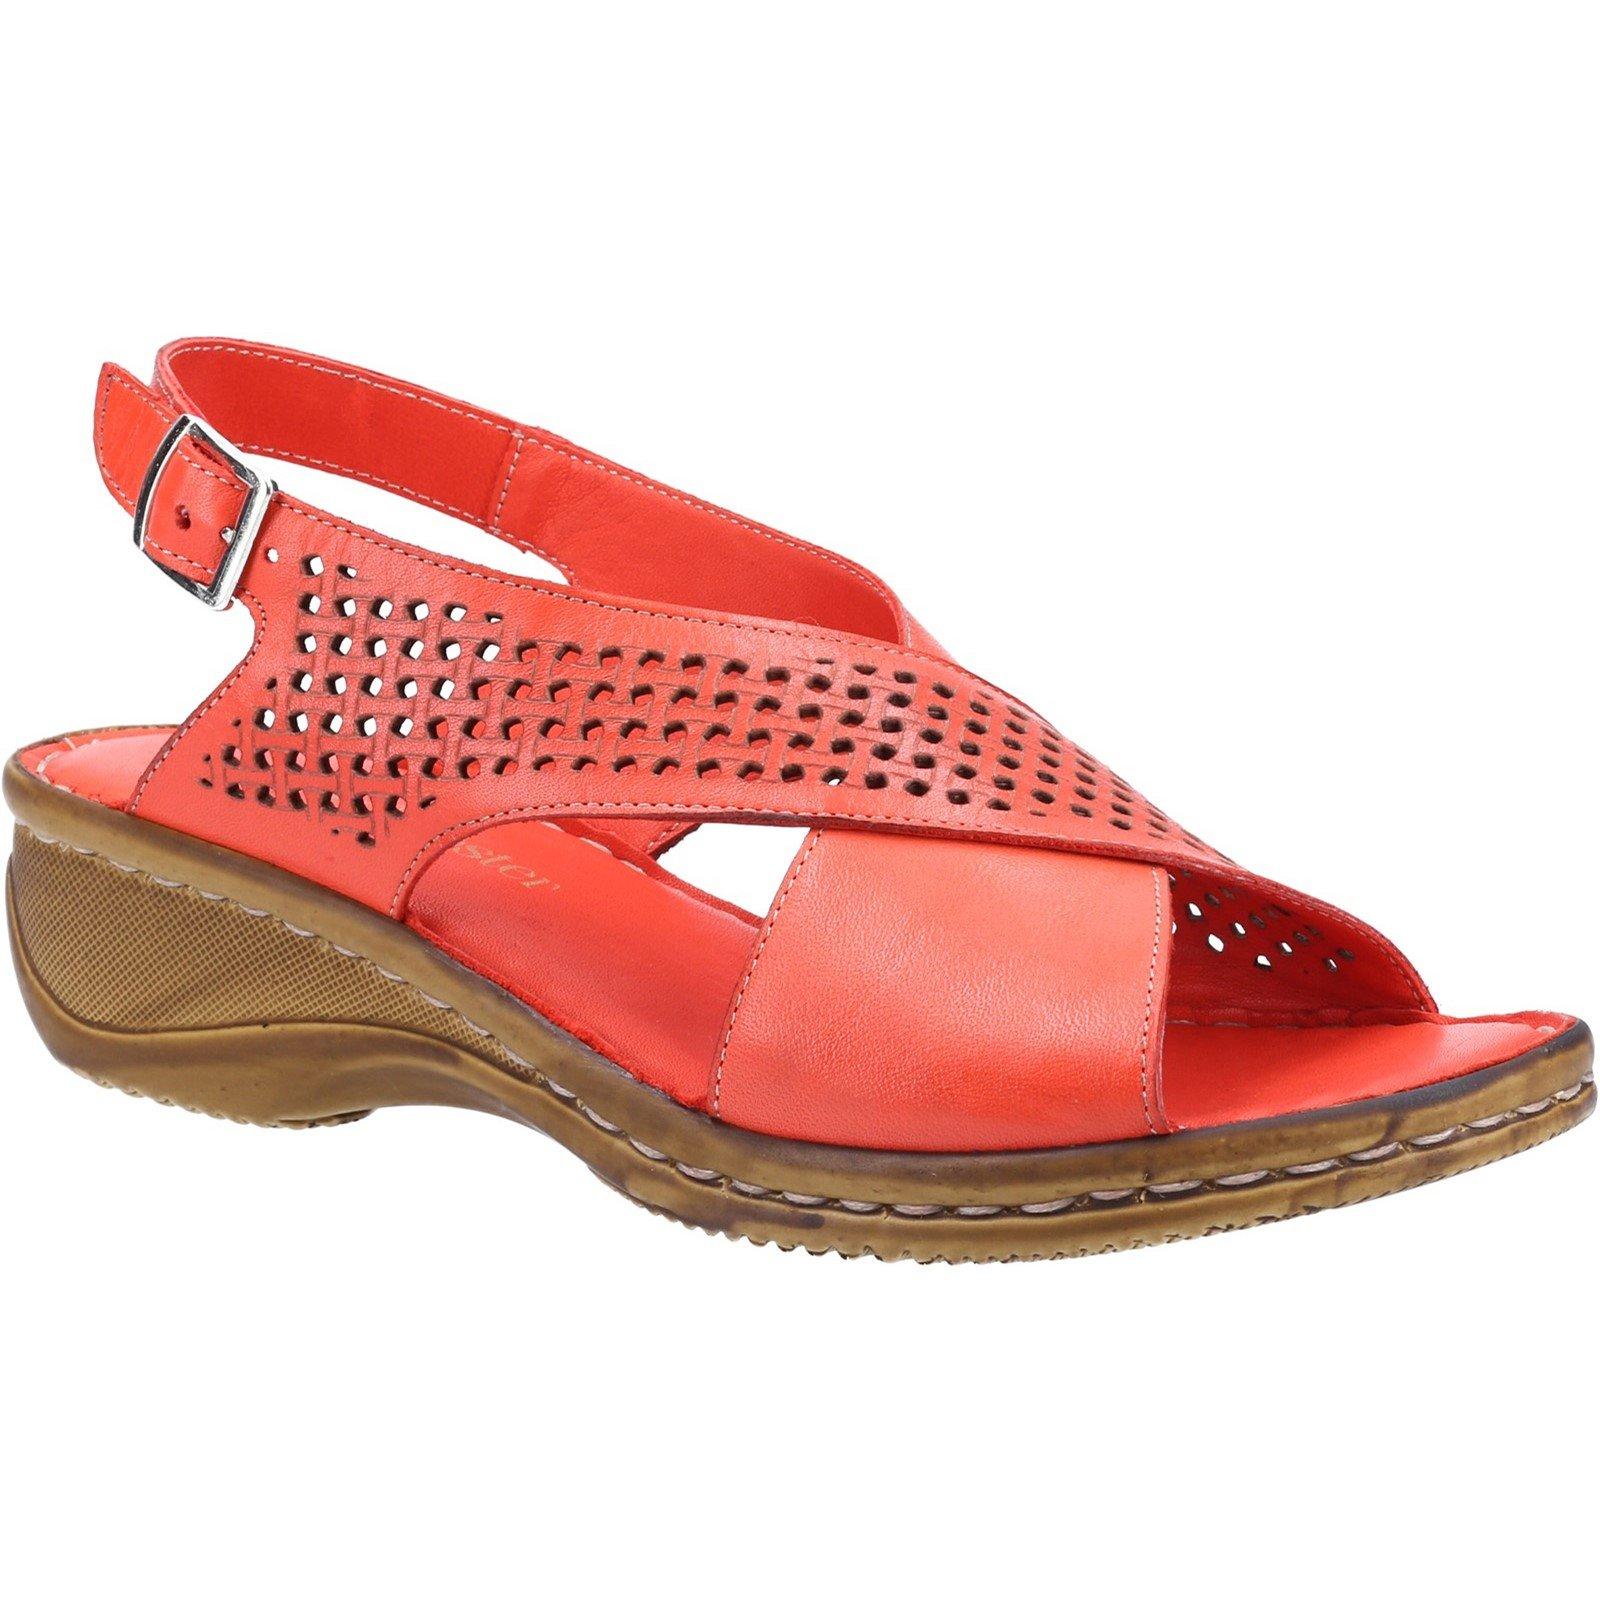 Fleet & Foster Women's Judith Open Toe Sandal Various Colours 31915 - Red 3